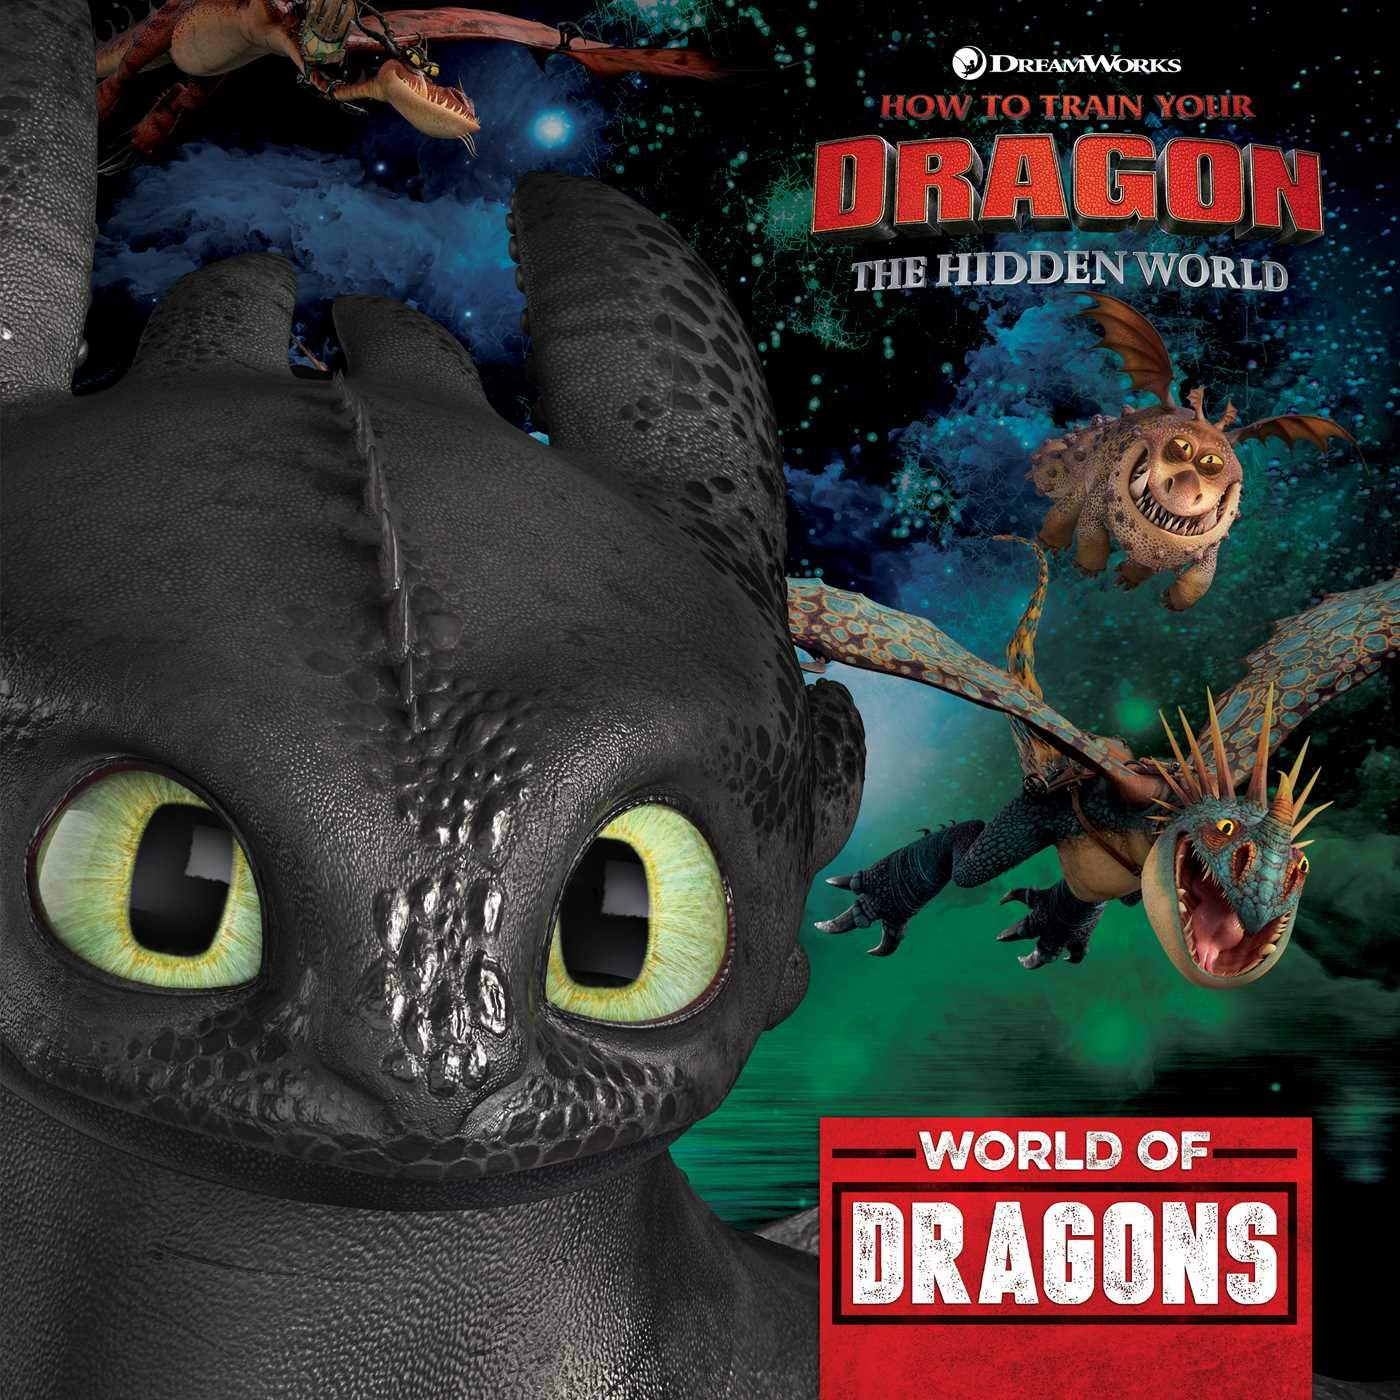 World Of Dragons How To Train Your Dragon Hidden World Nakamura May Spaziante Patrick 9781534437388 Amazon Com Books